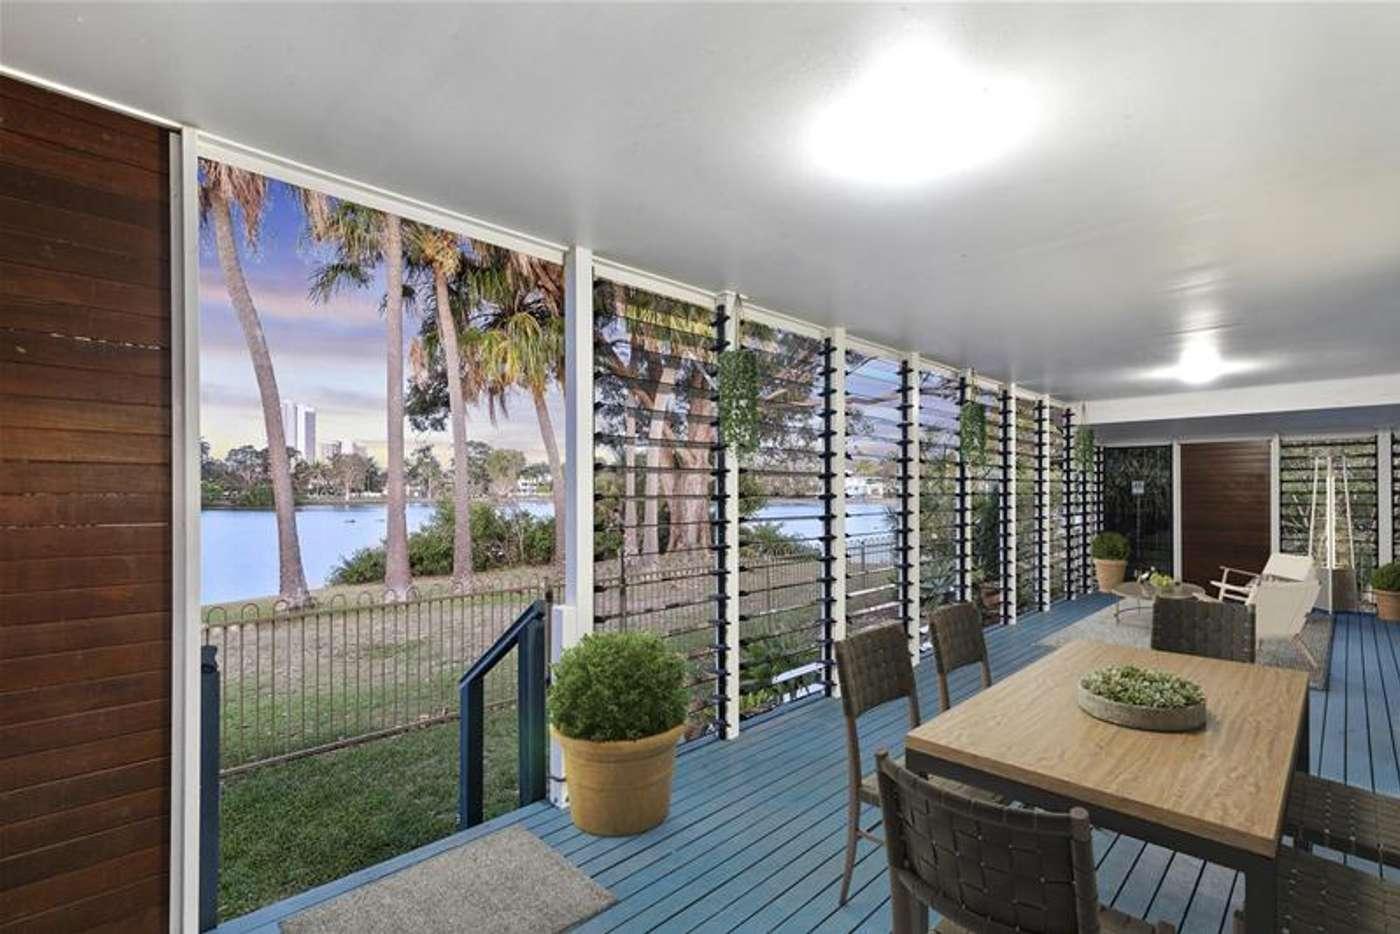 Main view of Homely house listing, 37 Tahiti Avenue, Palm Beach QLD 4221